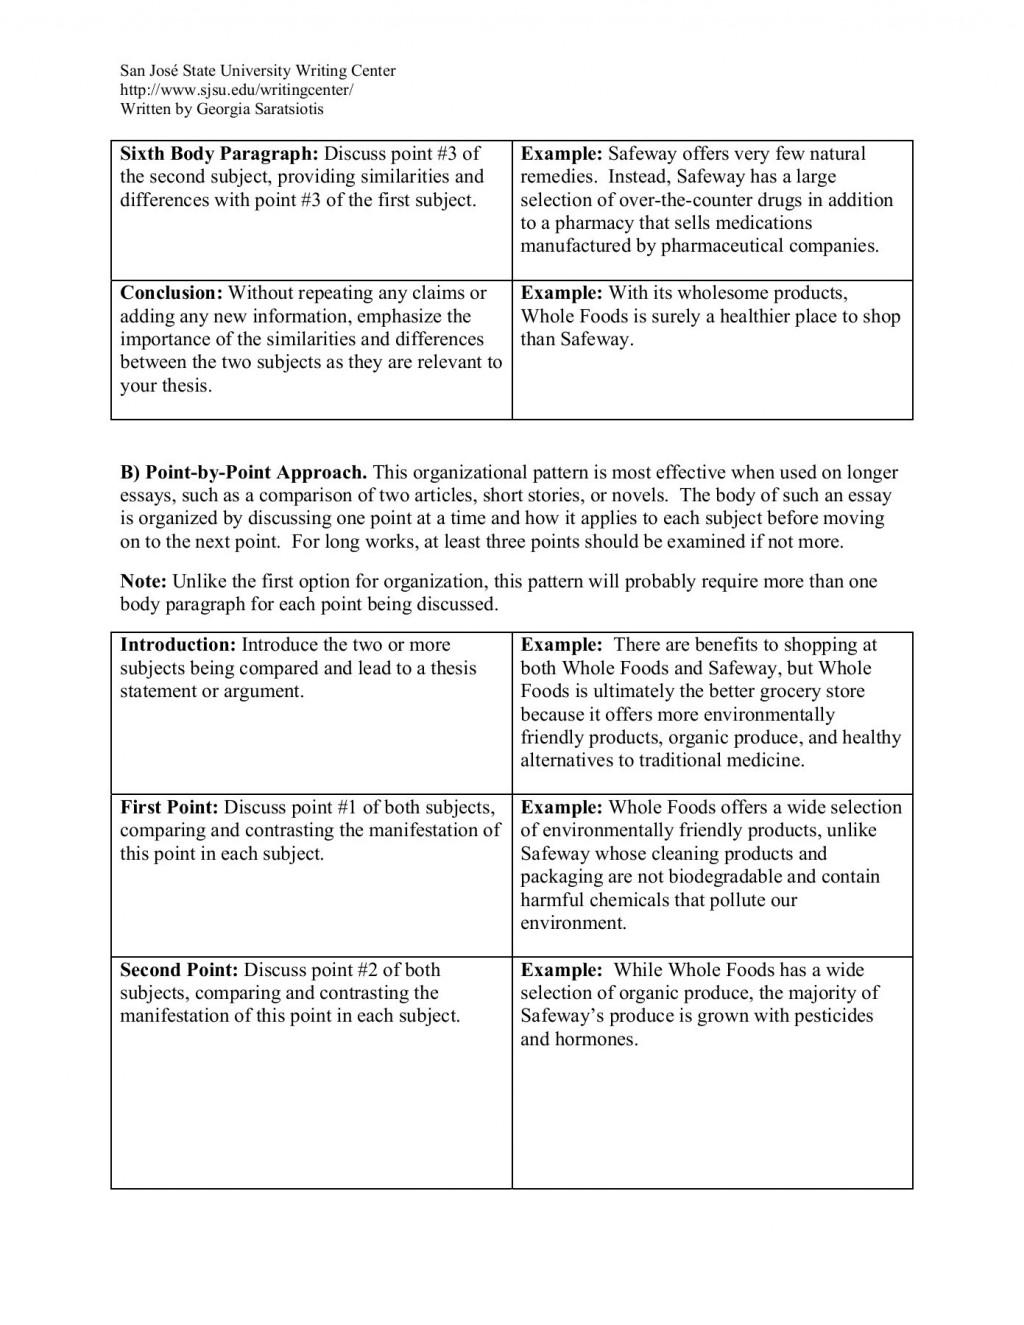 009 Essay Example Organization Fascinating Of Expository Persuasive Methods For Argumentative Essays Large